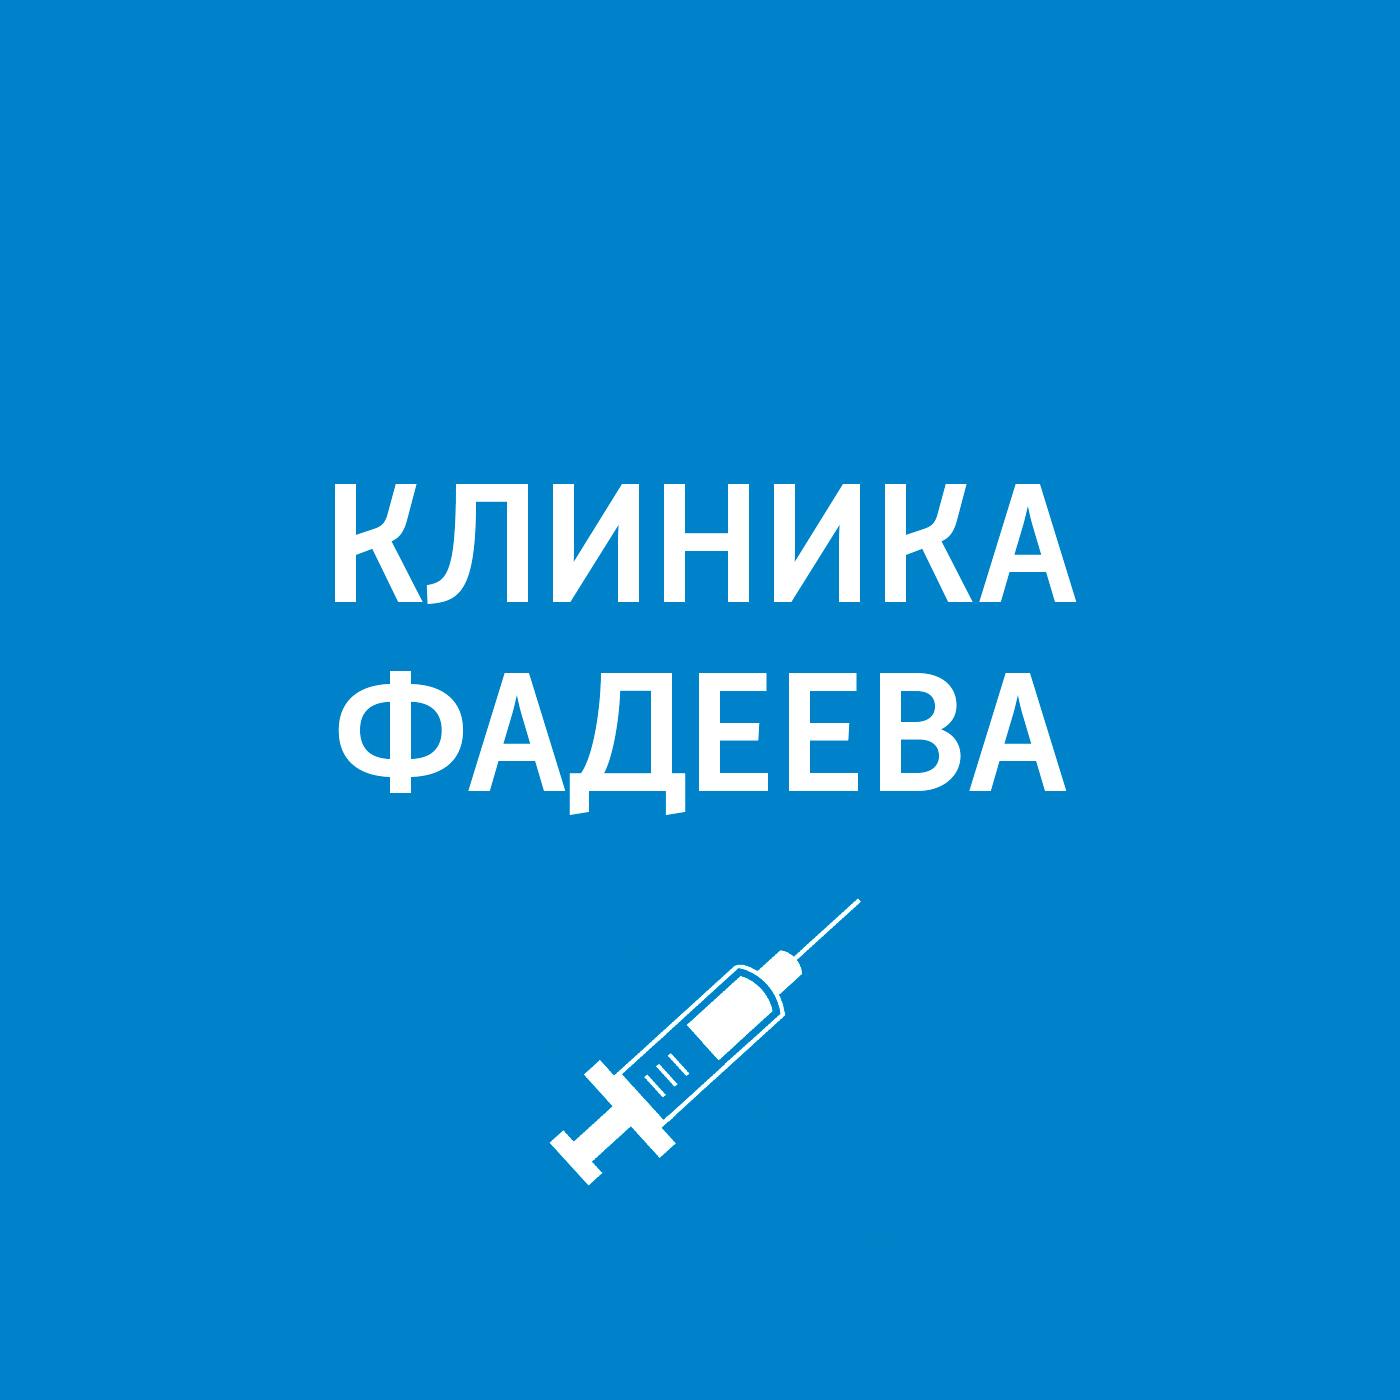 Пётр Фадеев Советы врача-нарколога цена 2017